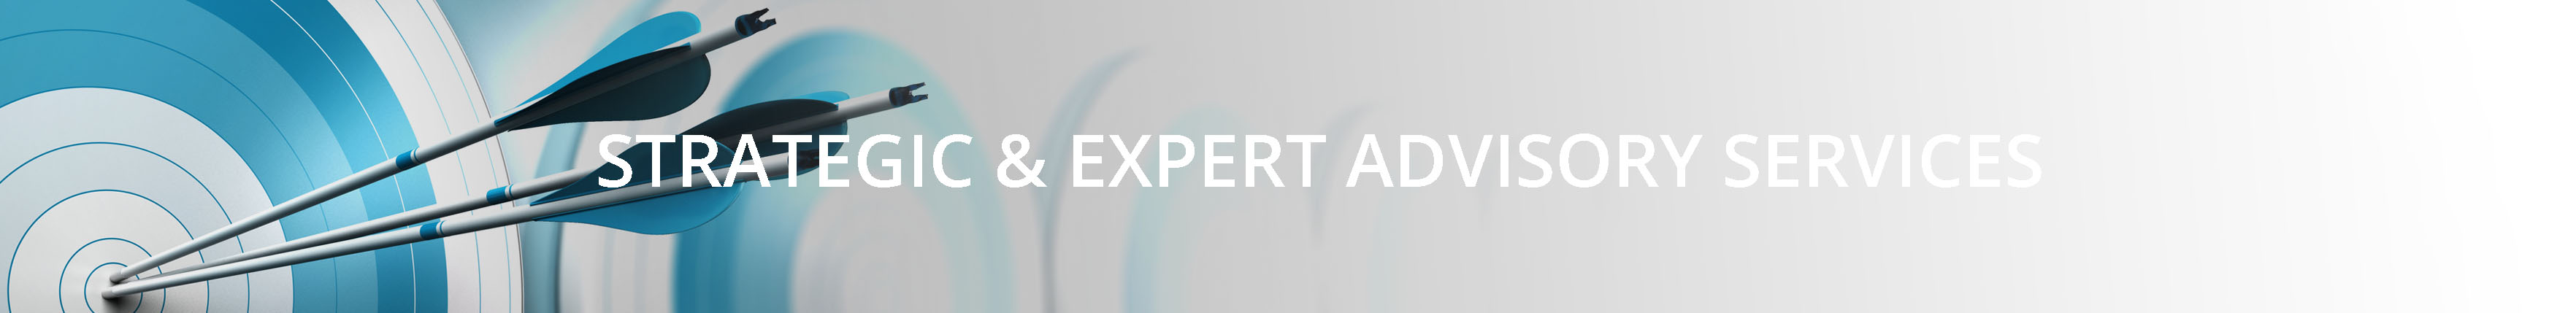 Strategic Expert Advice Services